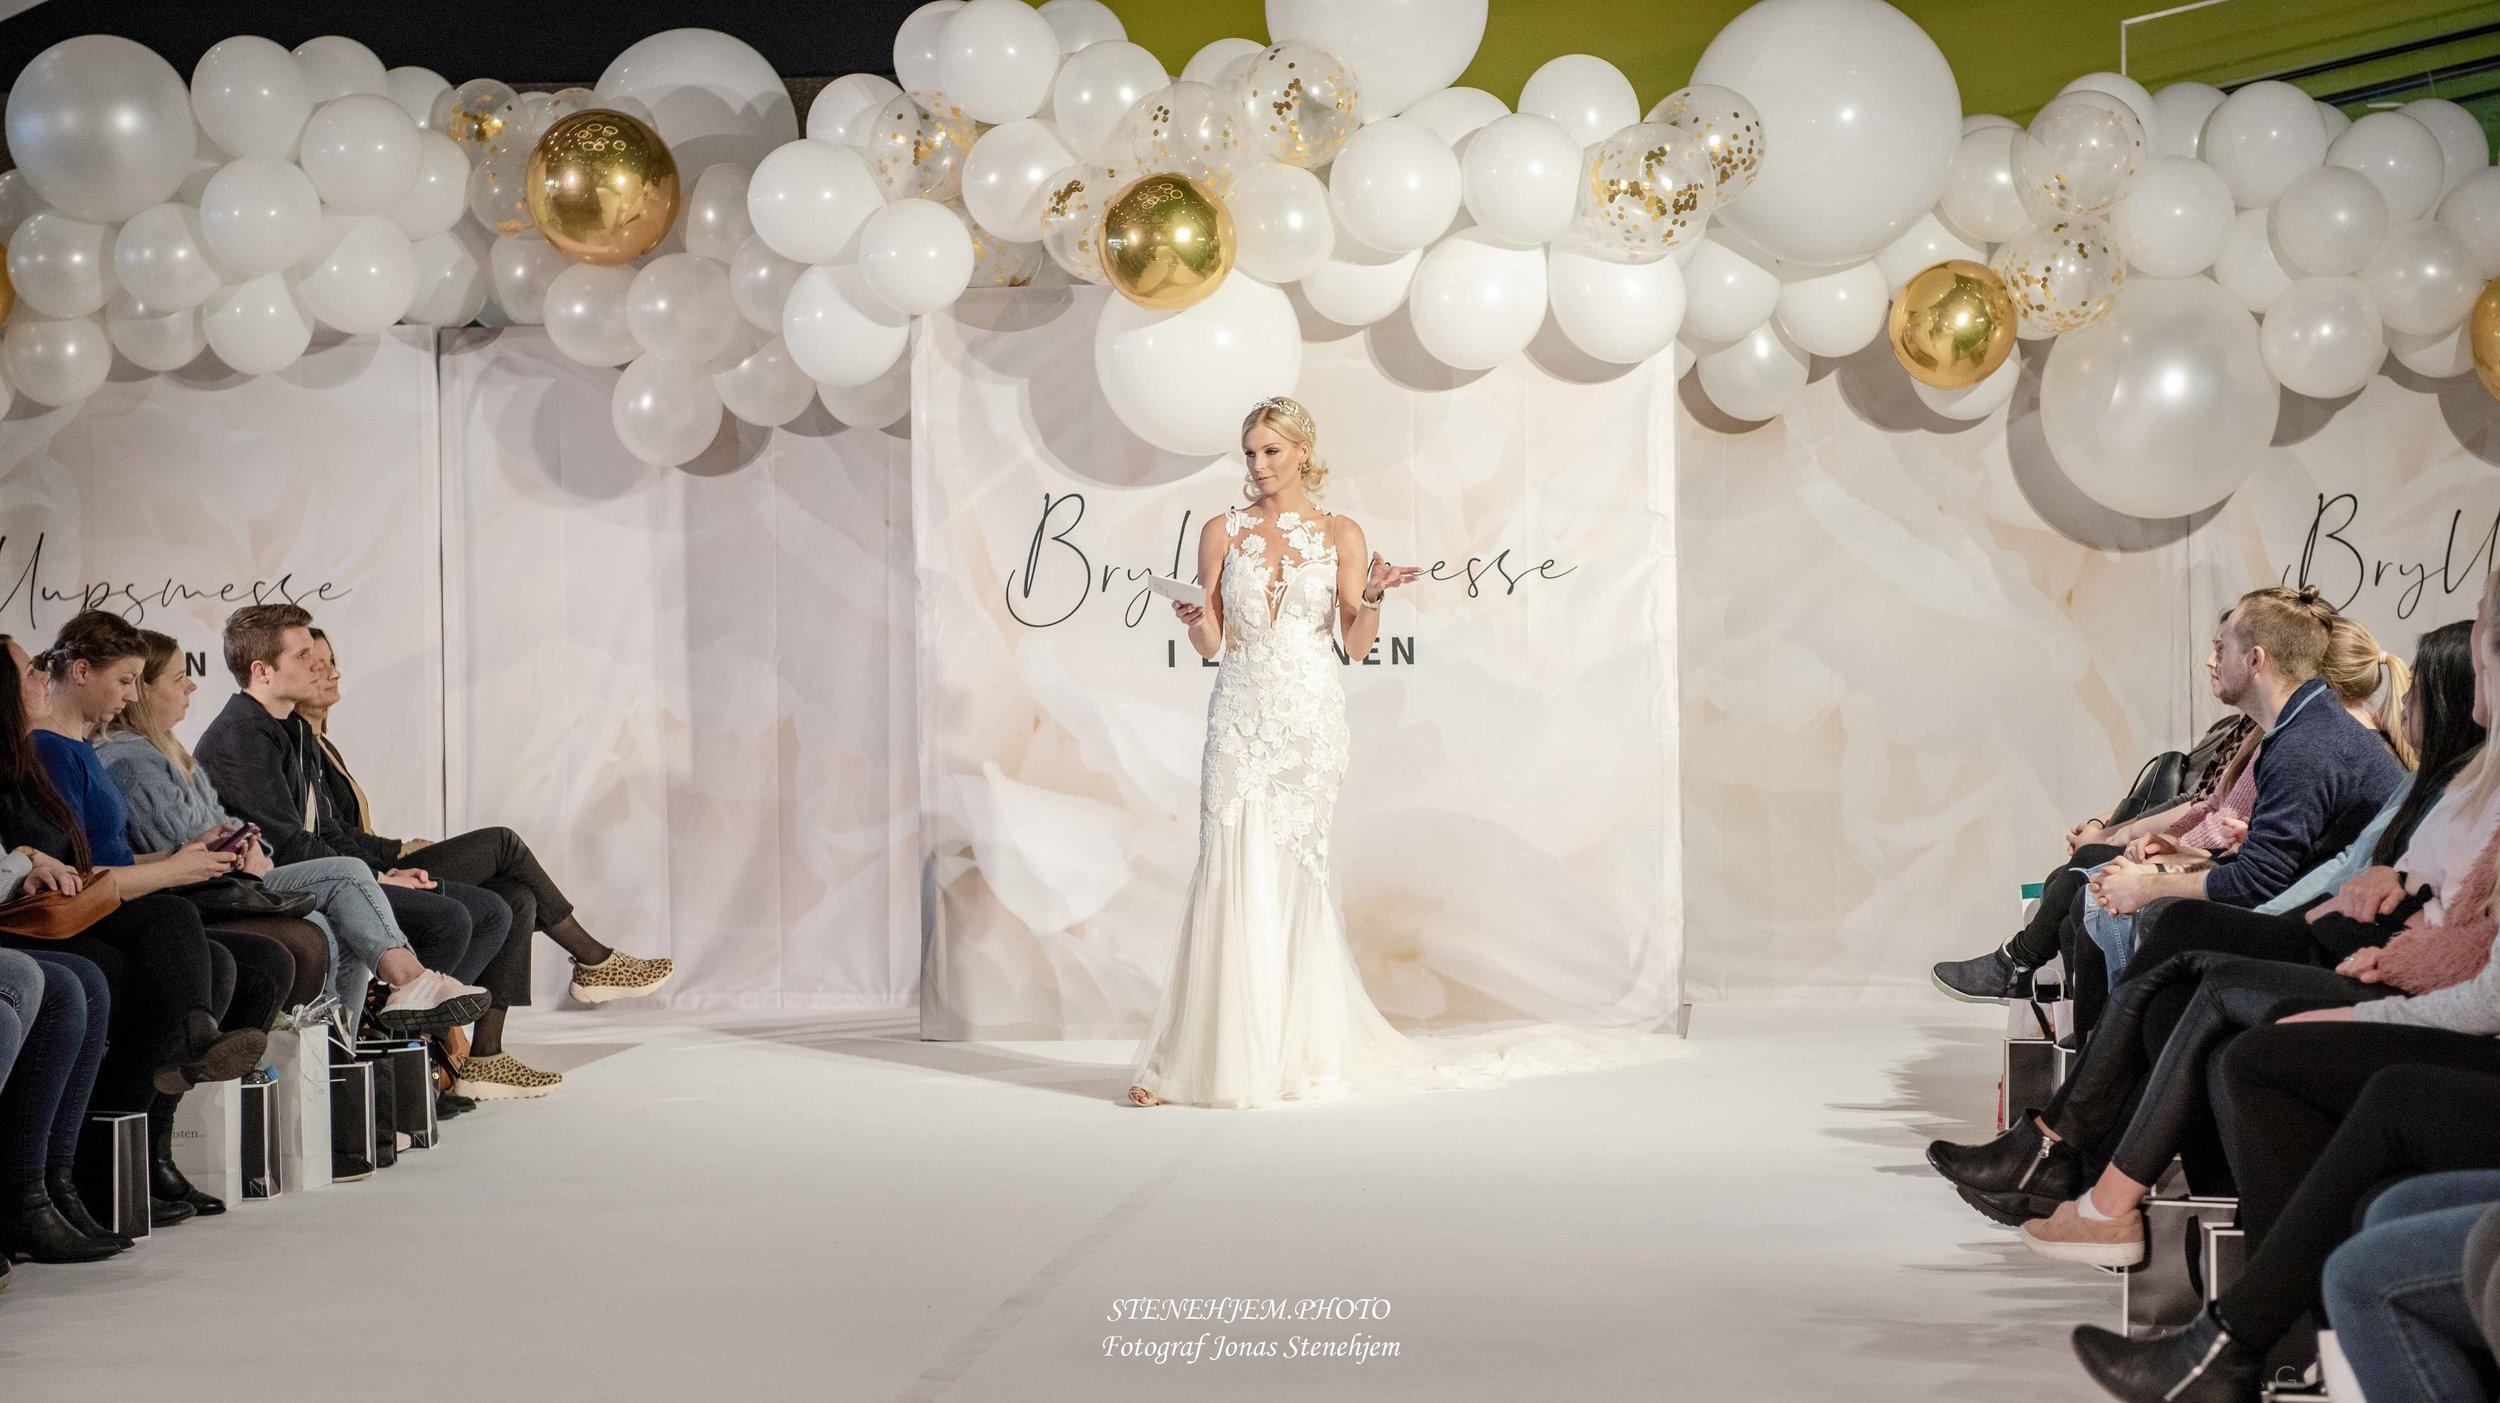 Bryllupsmesse_Lagunen_mittaltweddingfair__097.jpg